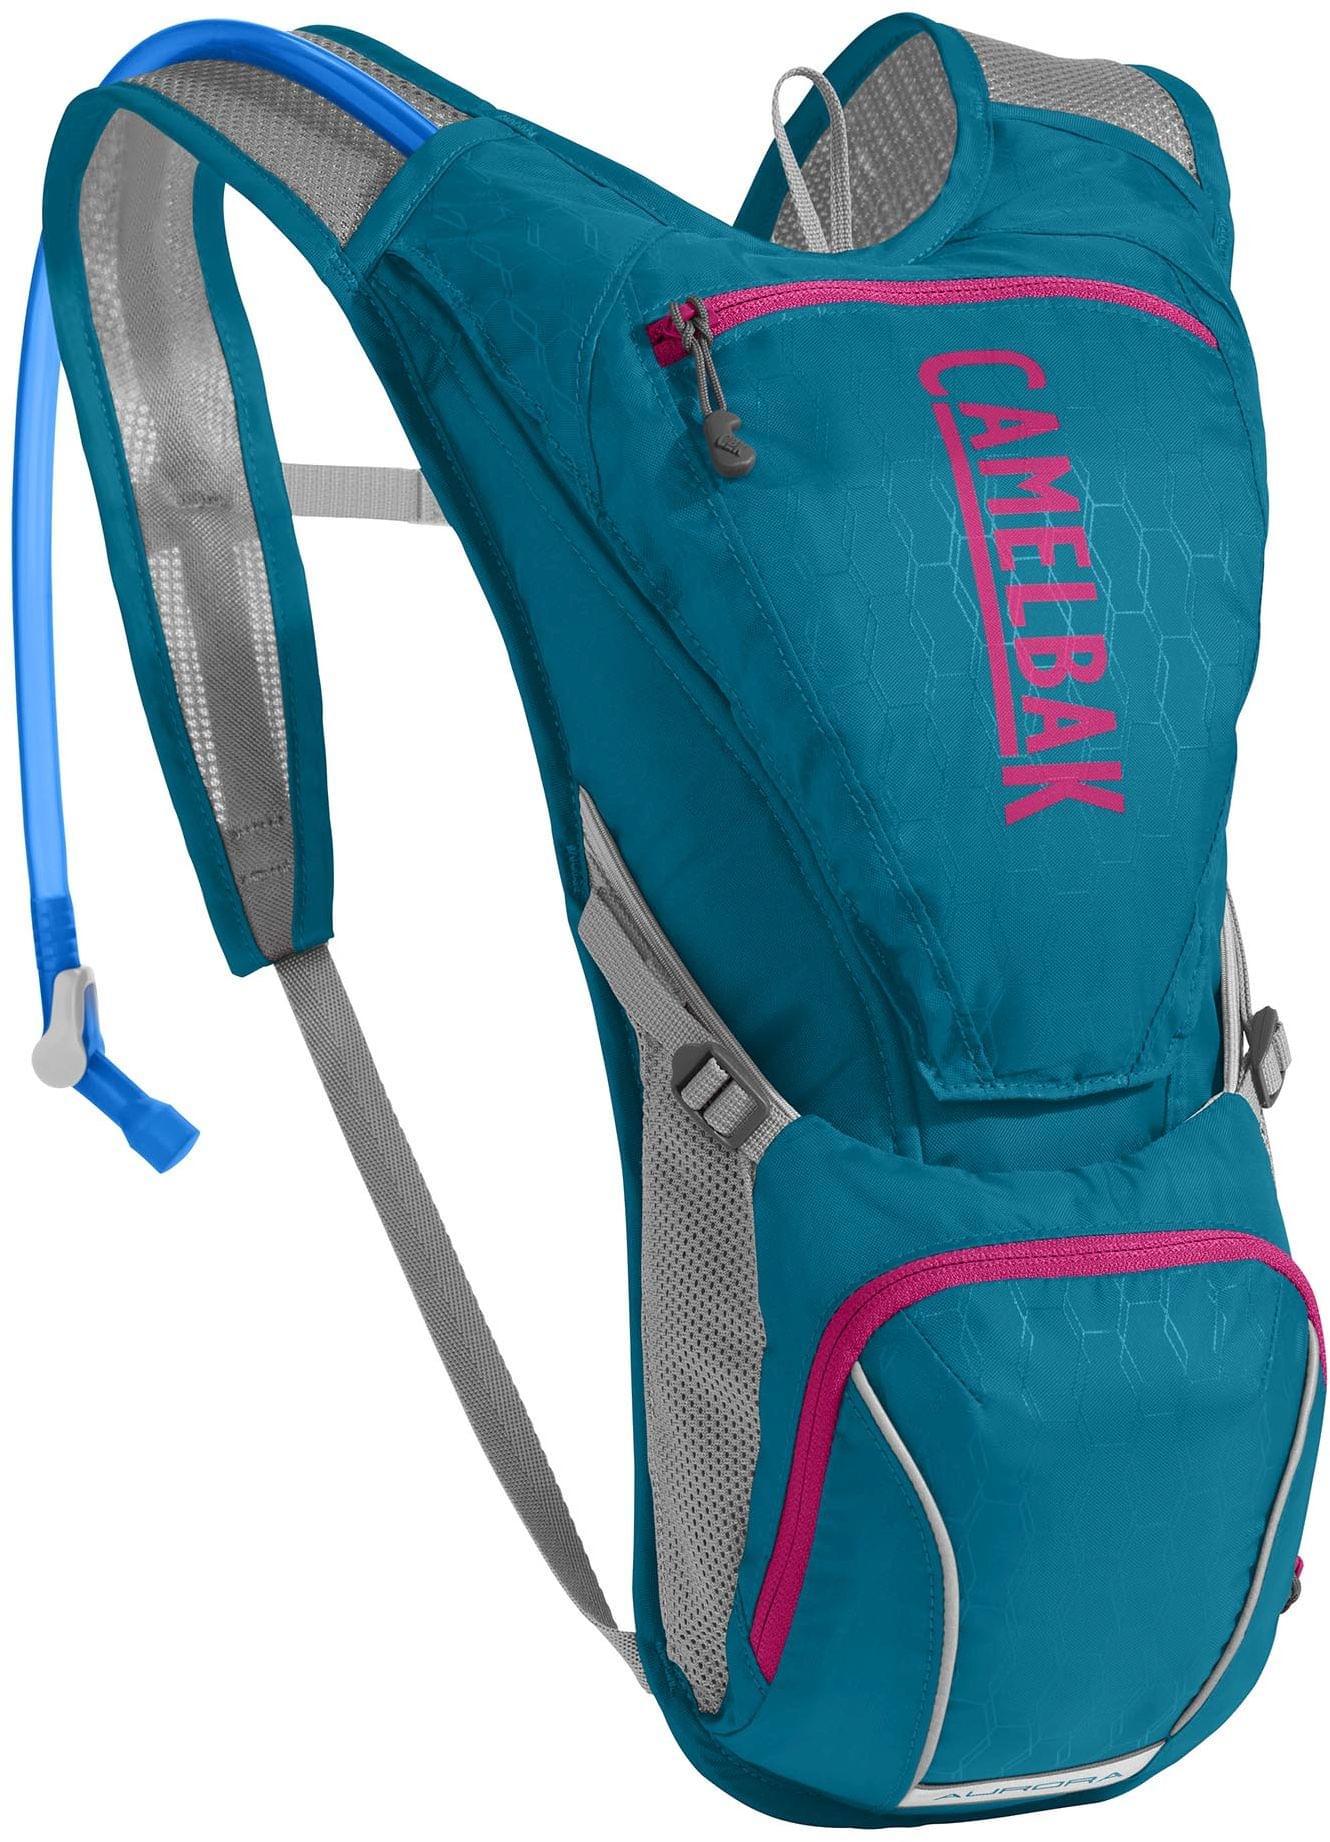 Camelbak Aurora - Teal/Pink uni